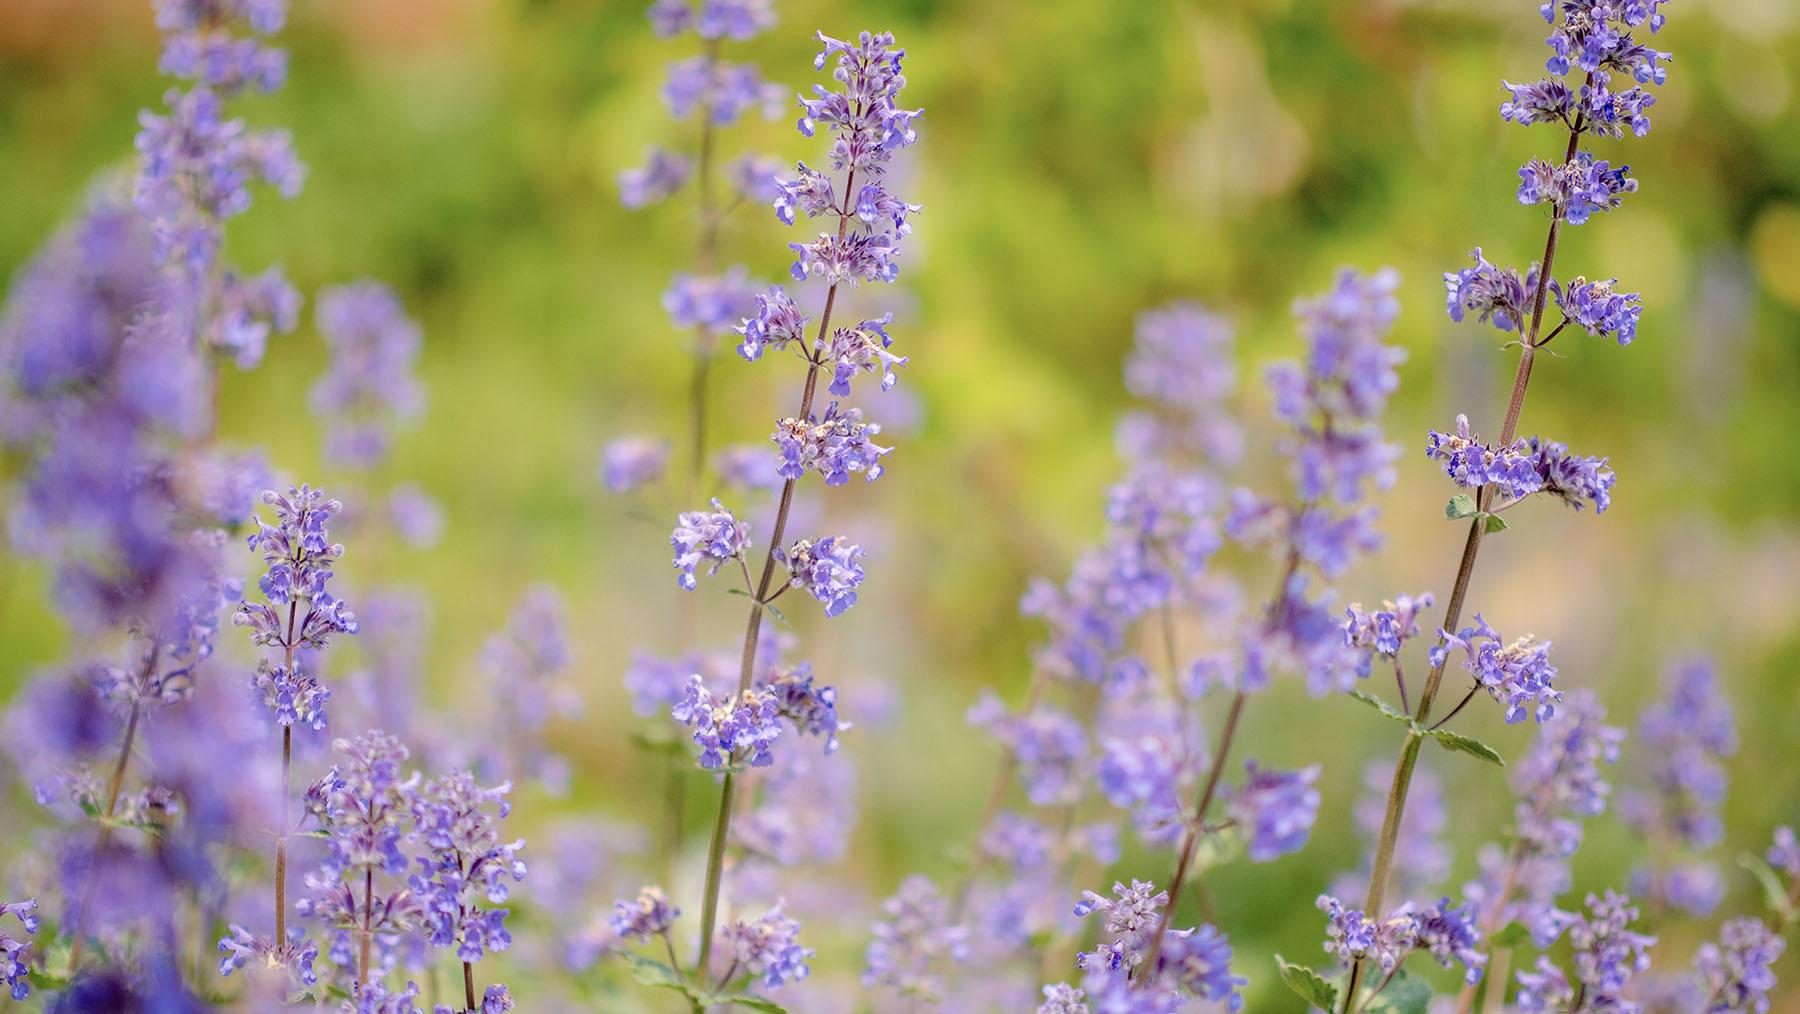 Close-up photo of plants in school garden